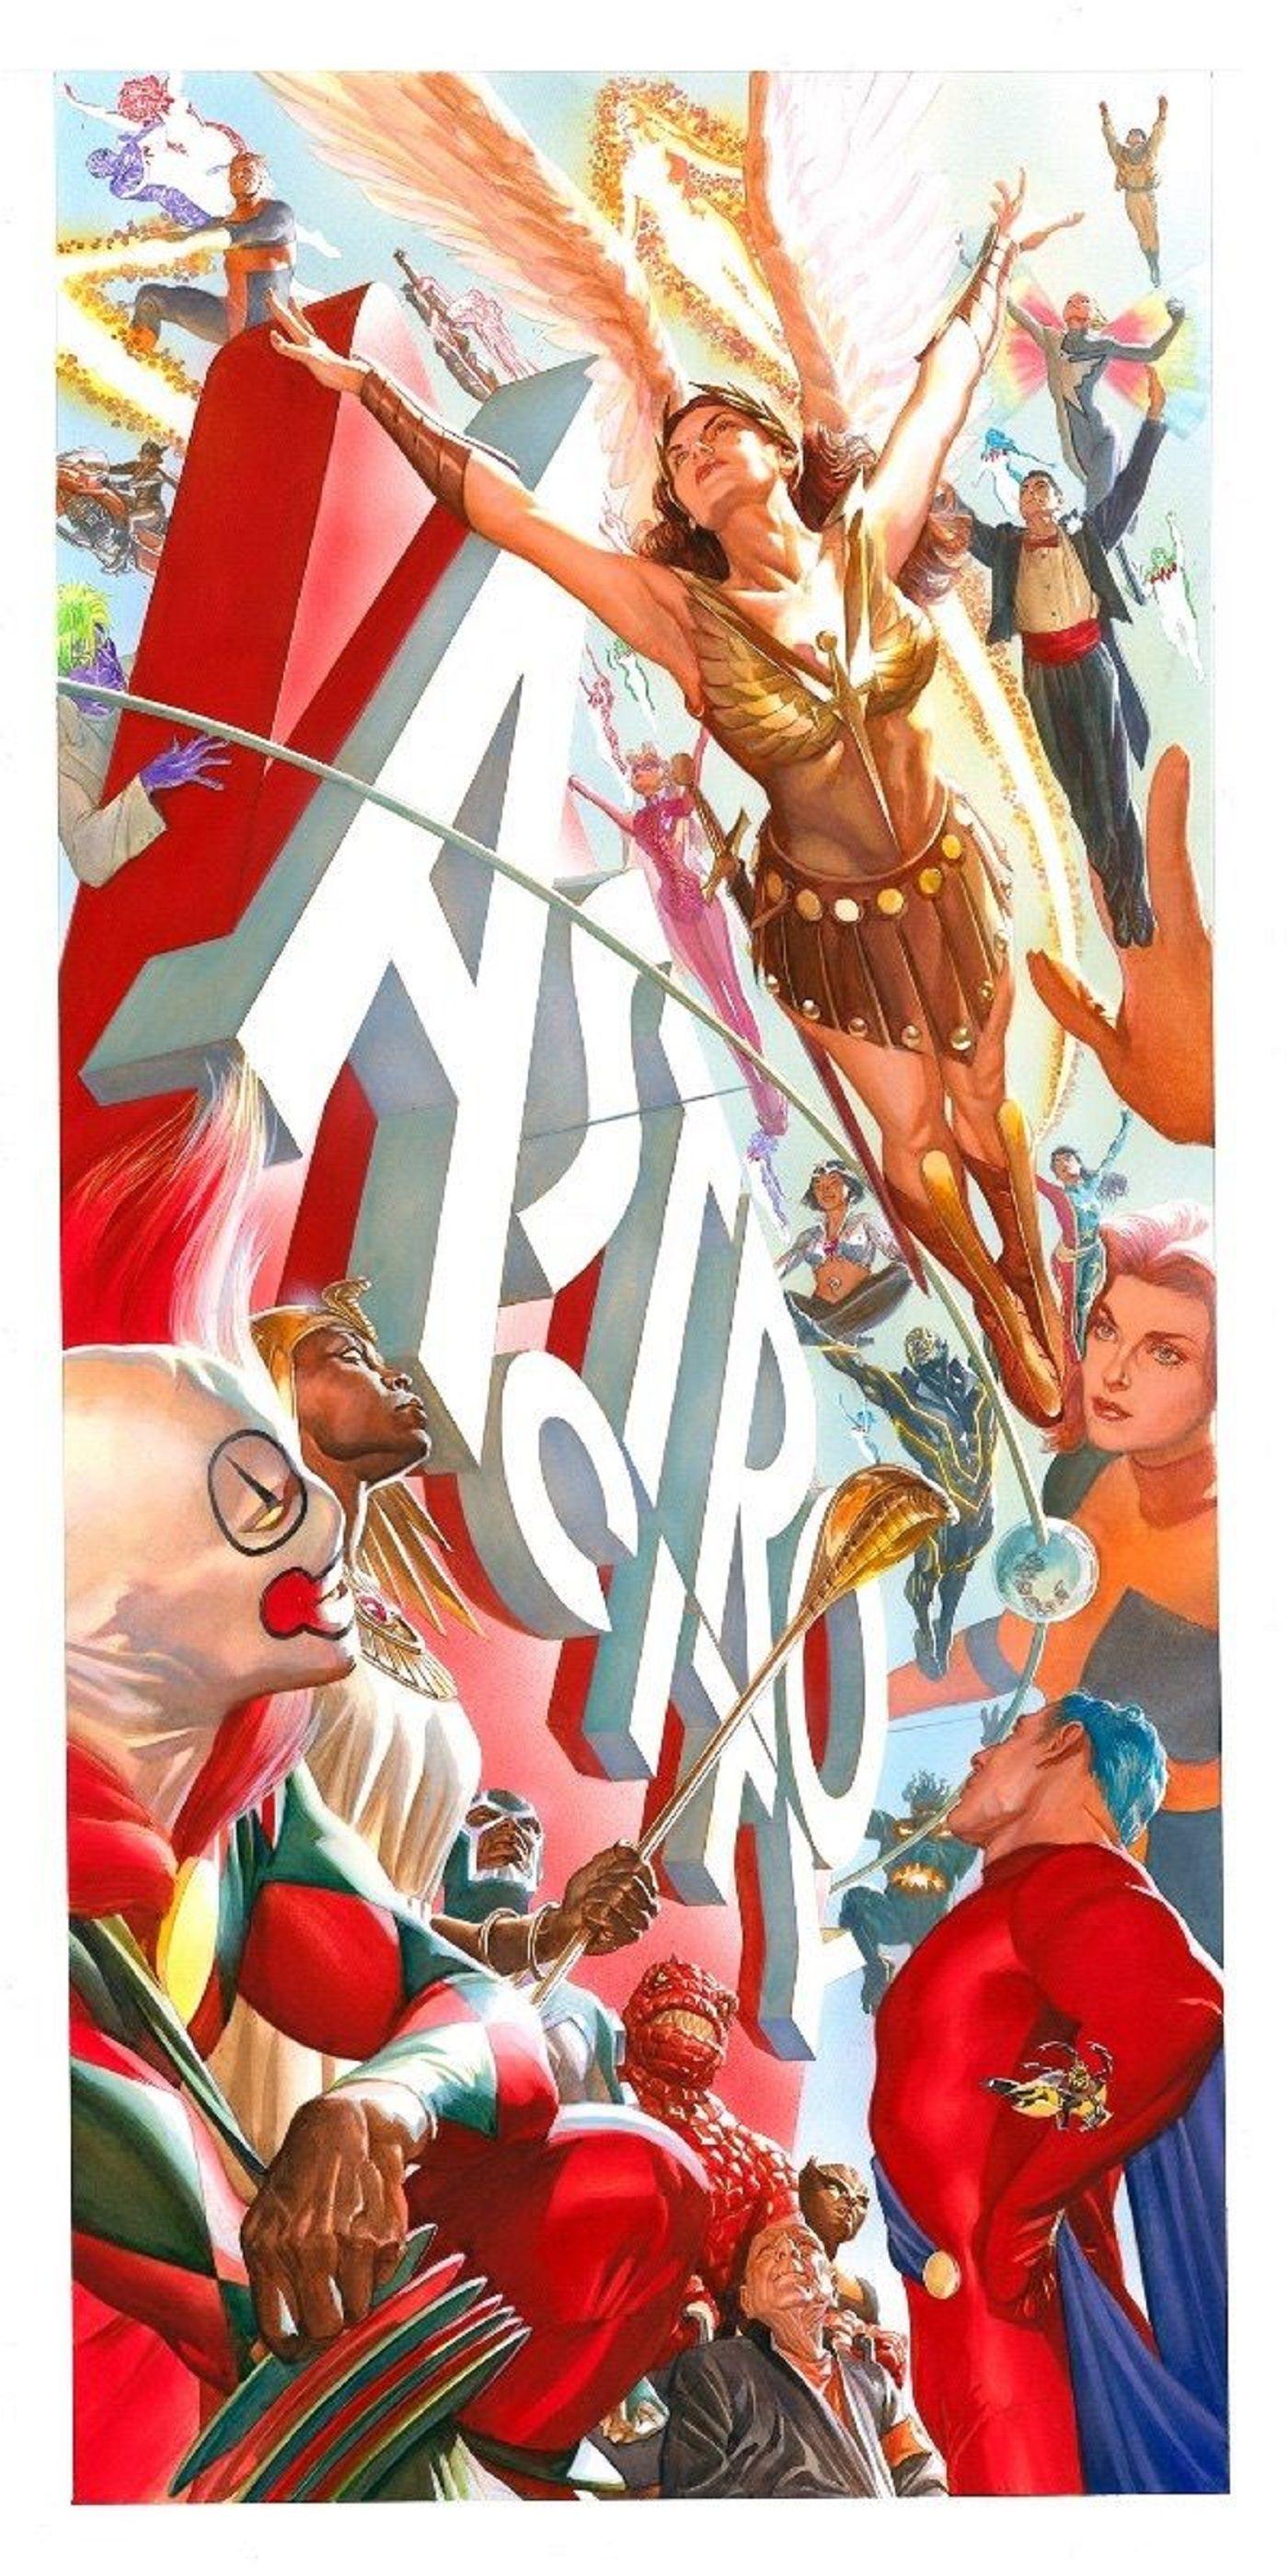 Kurt Busiek to write new Arrowsmith, Astro City Comics for the picture